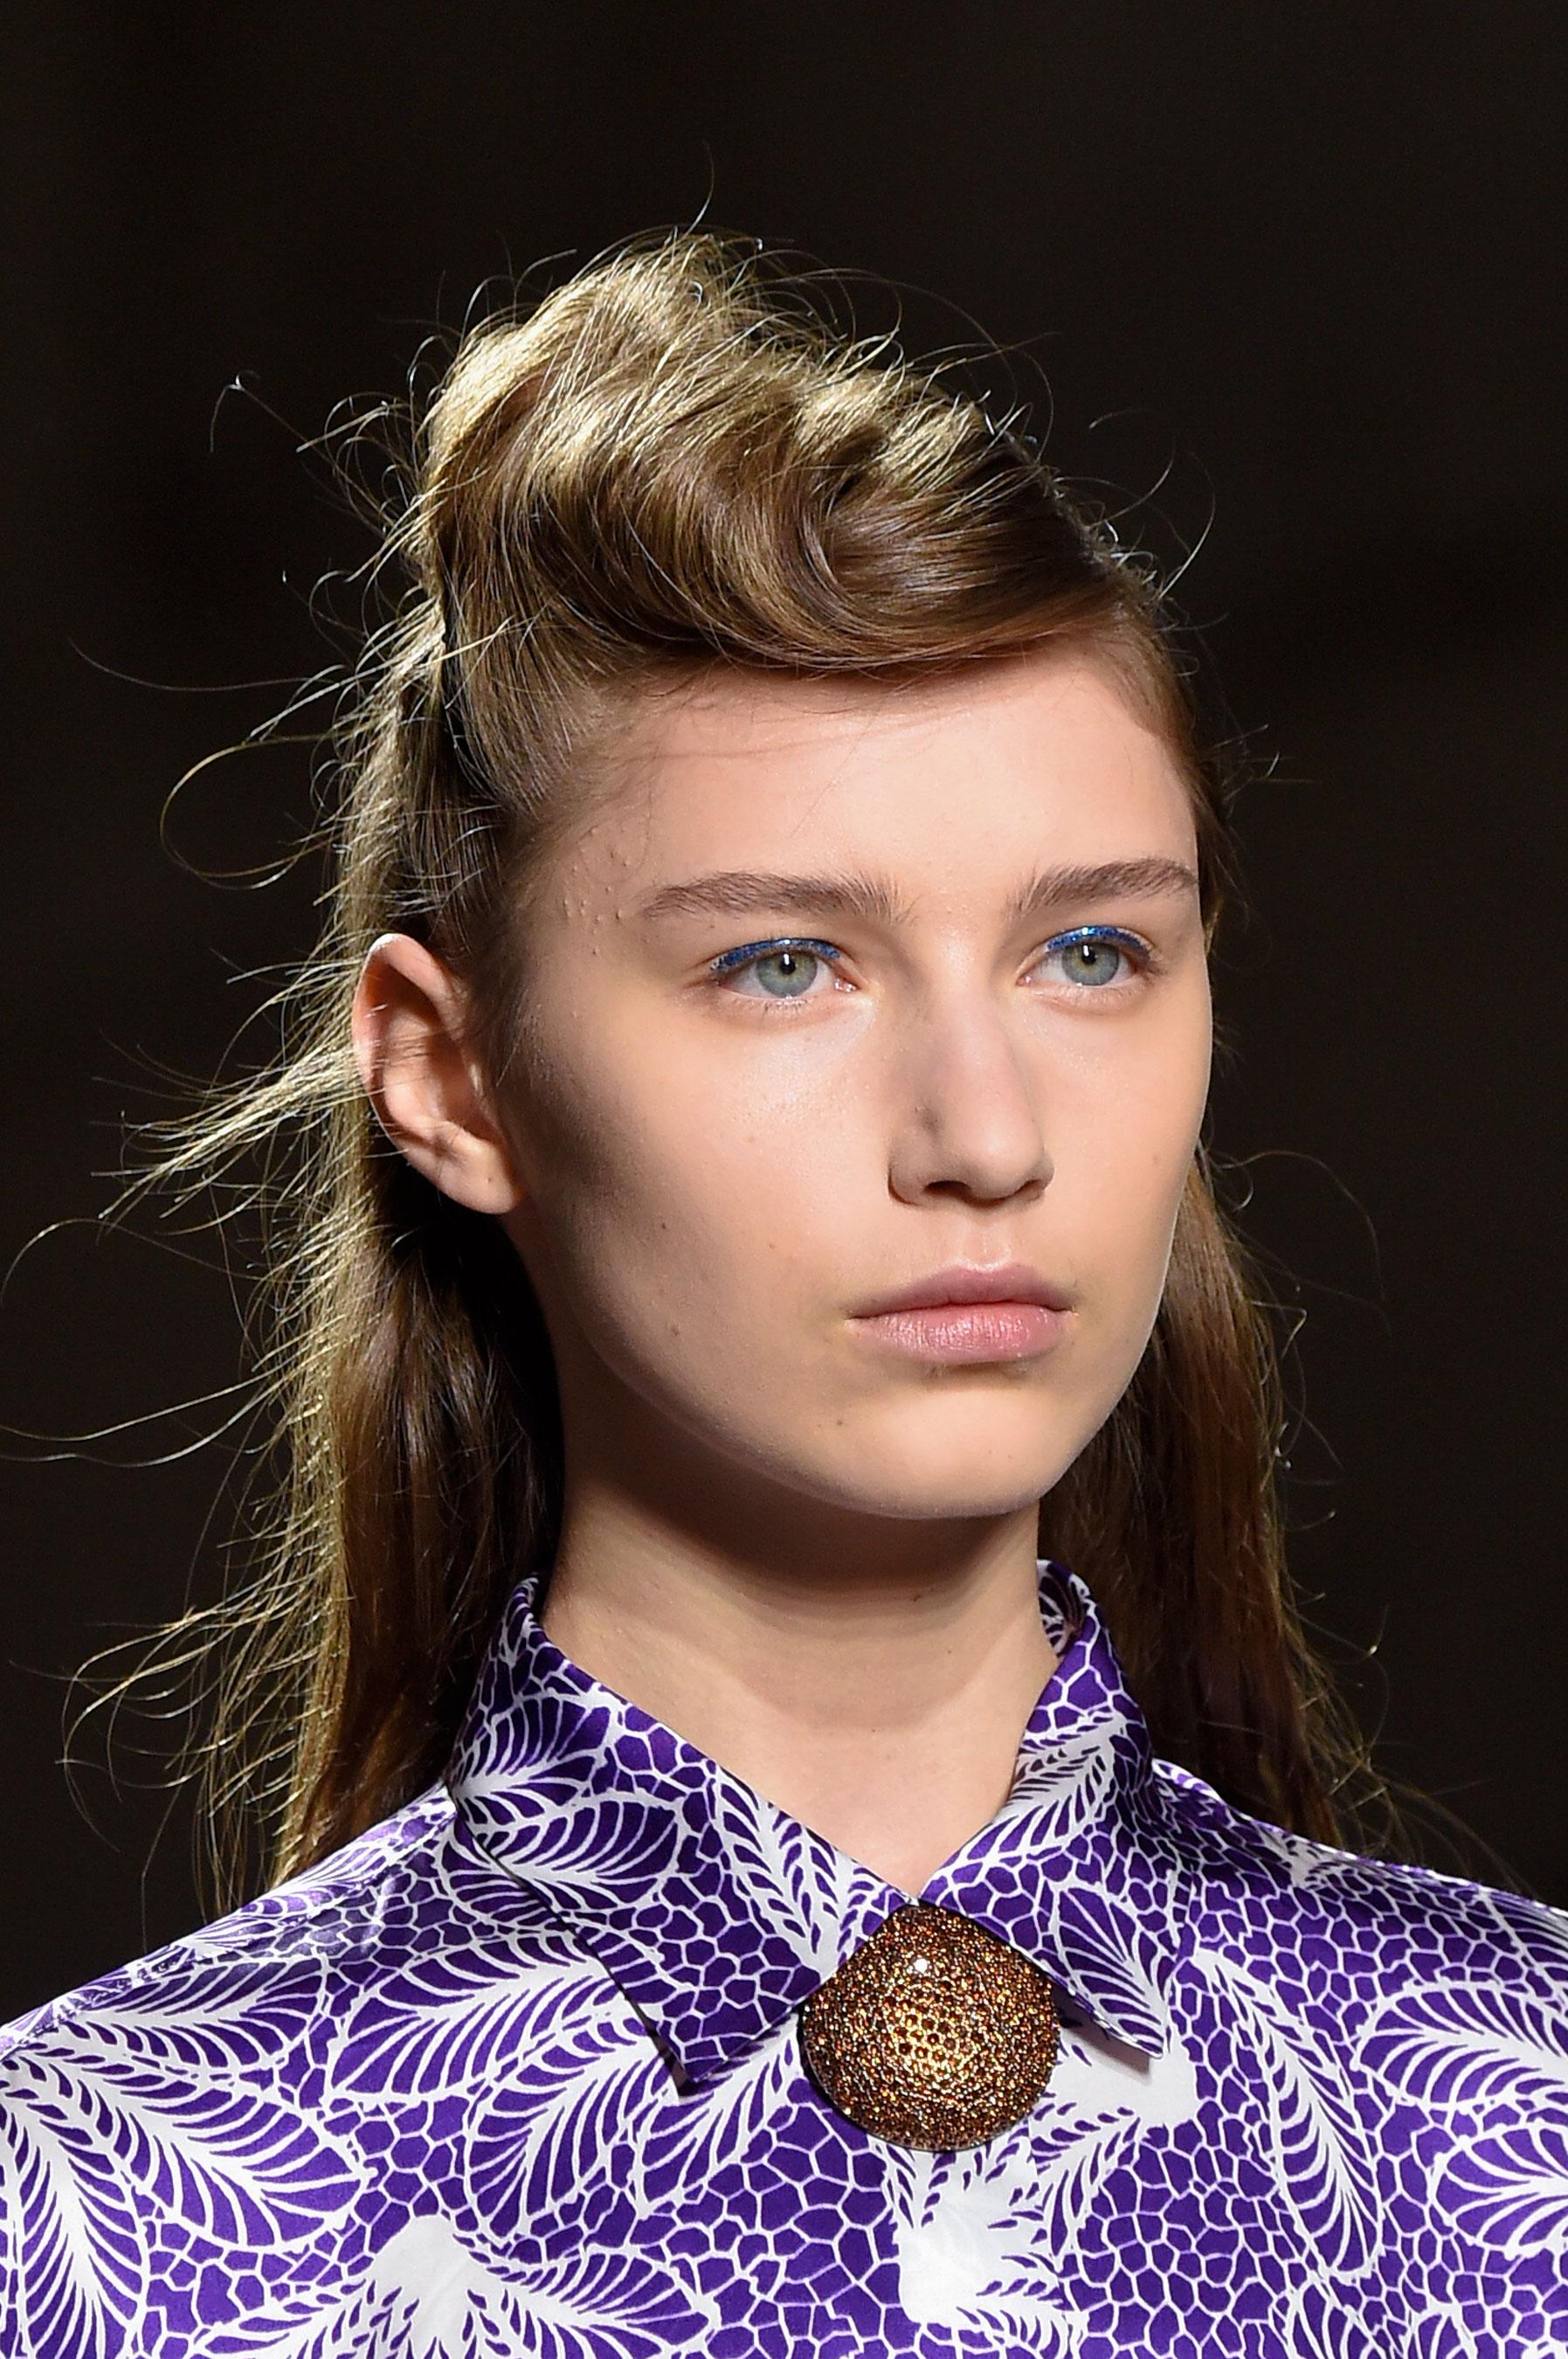 Dries-van-Noten-spring-2016-runway-beauty-fashion-show-the-impression-26